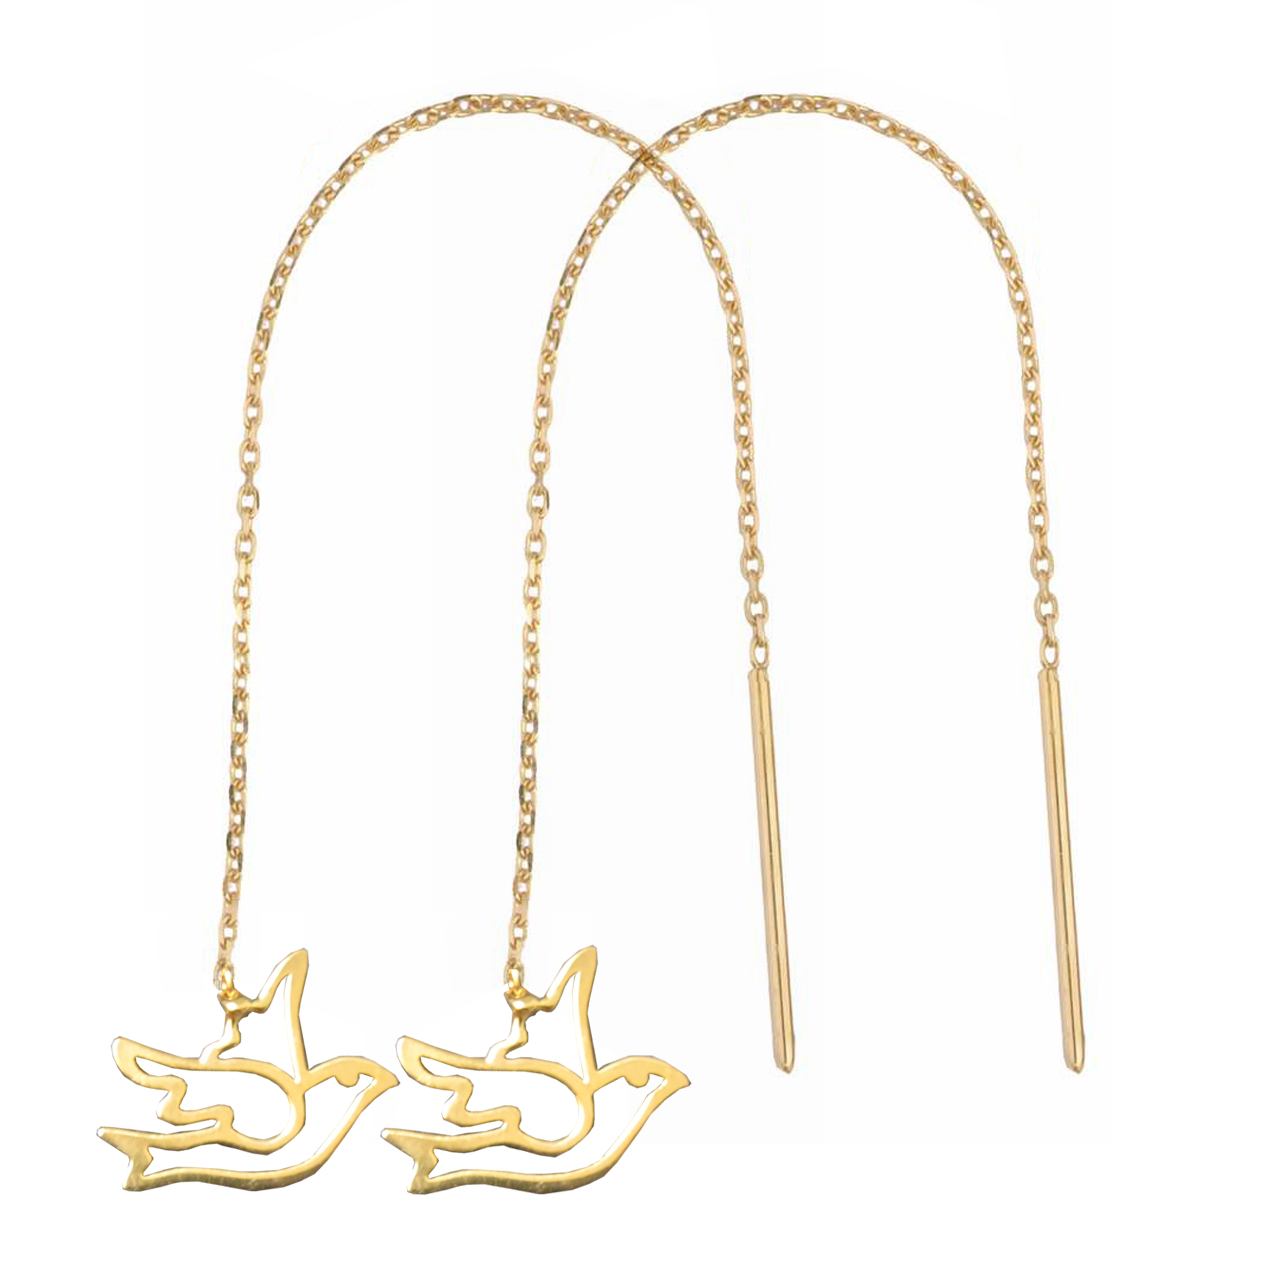 قیمت گوشواره طلا 18 عیار نازنین کد GR503